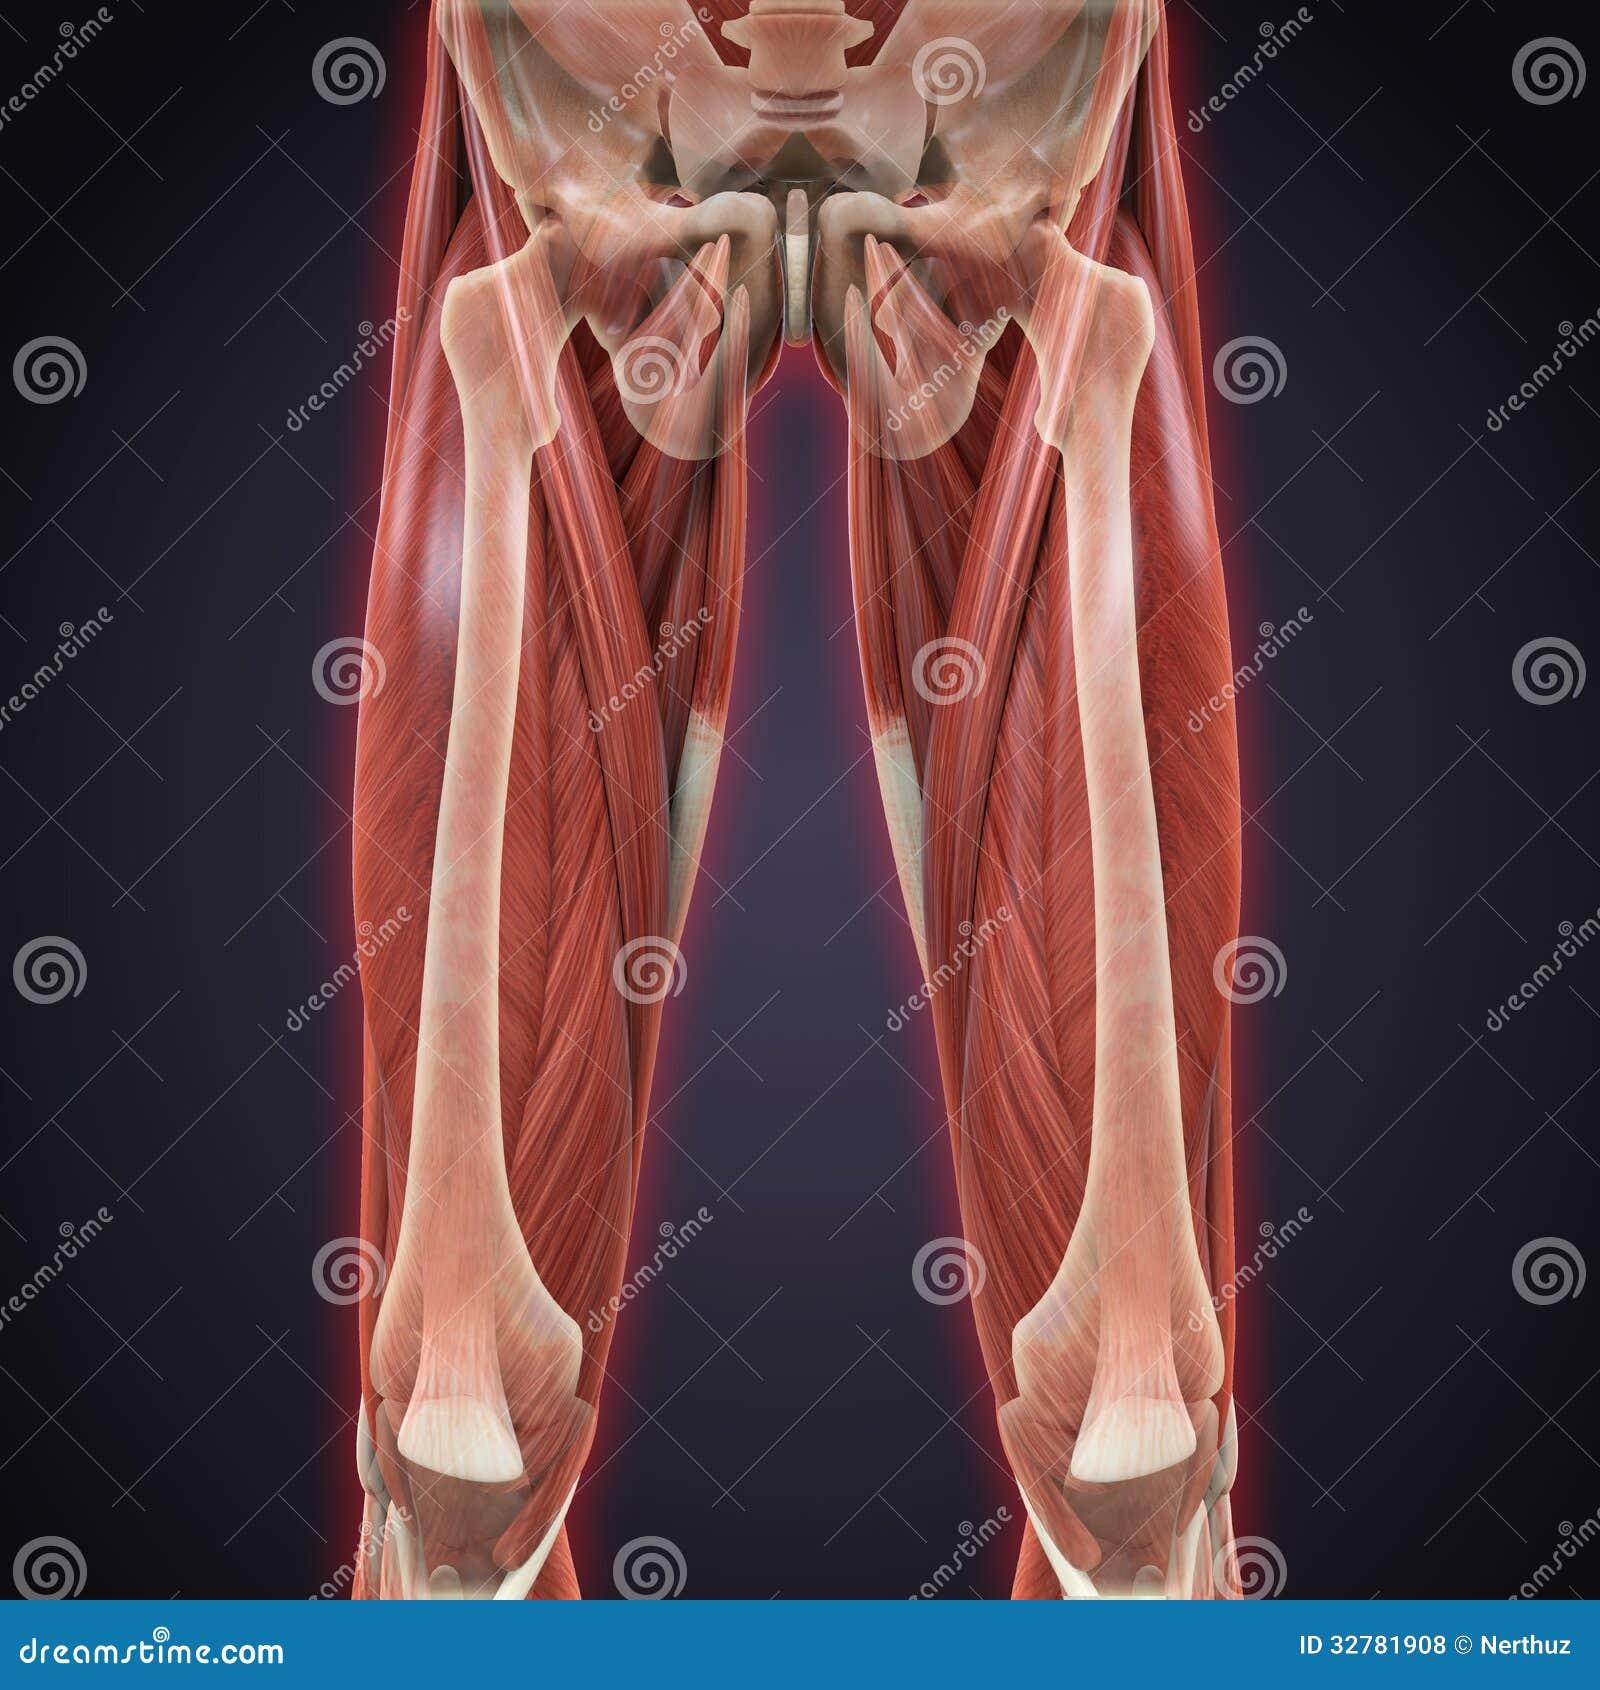 Upper Legs Muscles Anatomy Stock Illustration Illustration Of